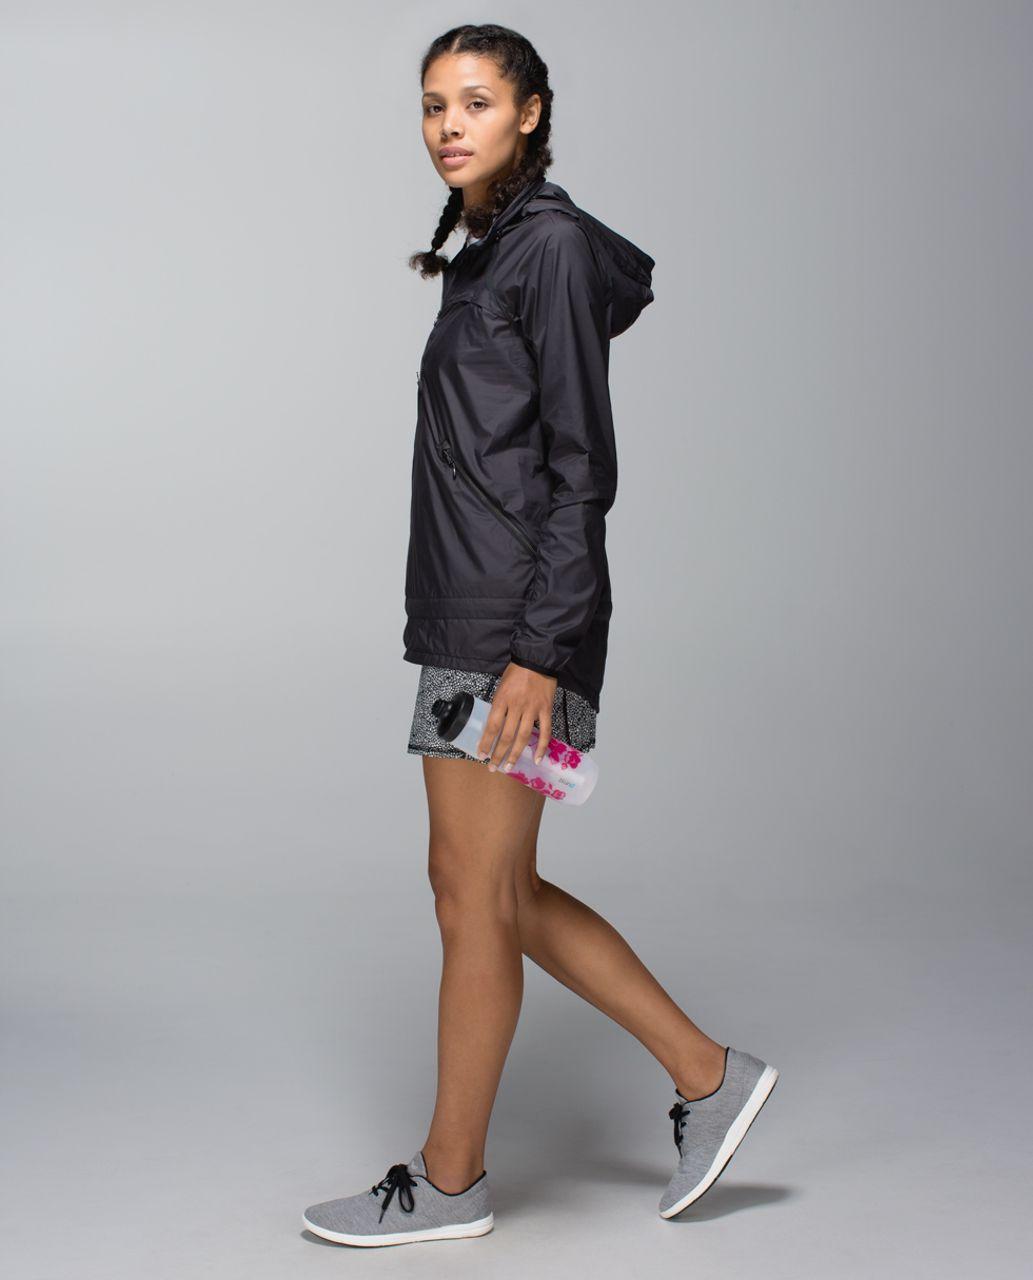 Lululemon Run:  Pace Setter Skirt *4-way Stretch (Regular) - Plush Petal Black Ghost / Black